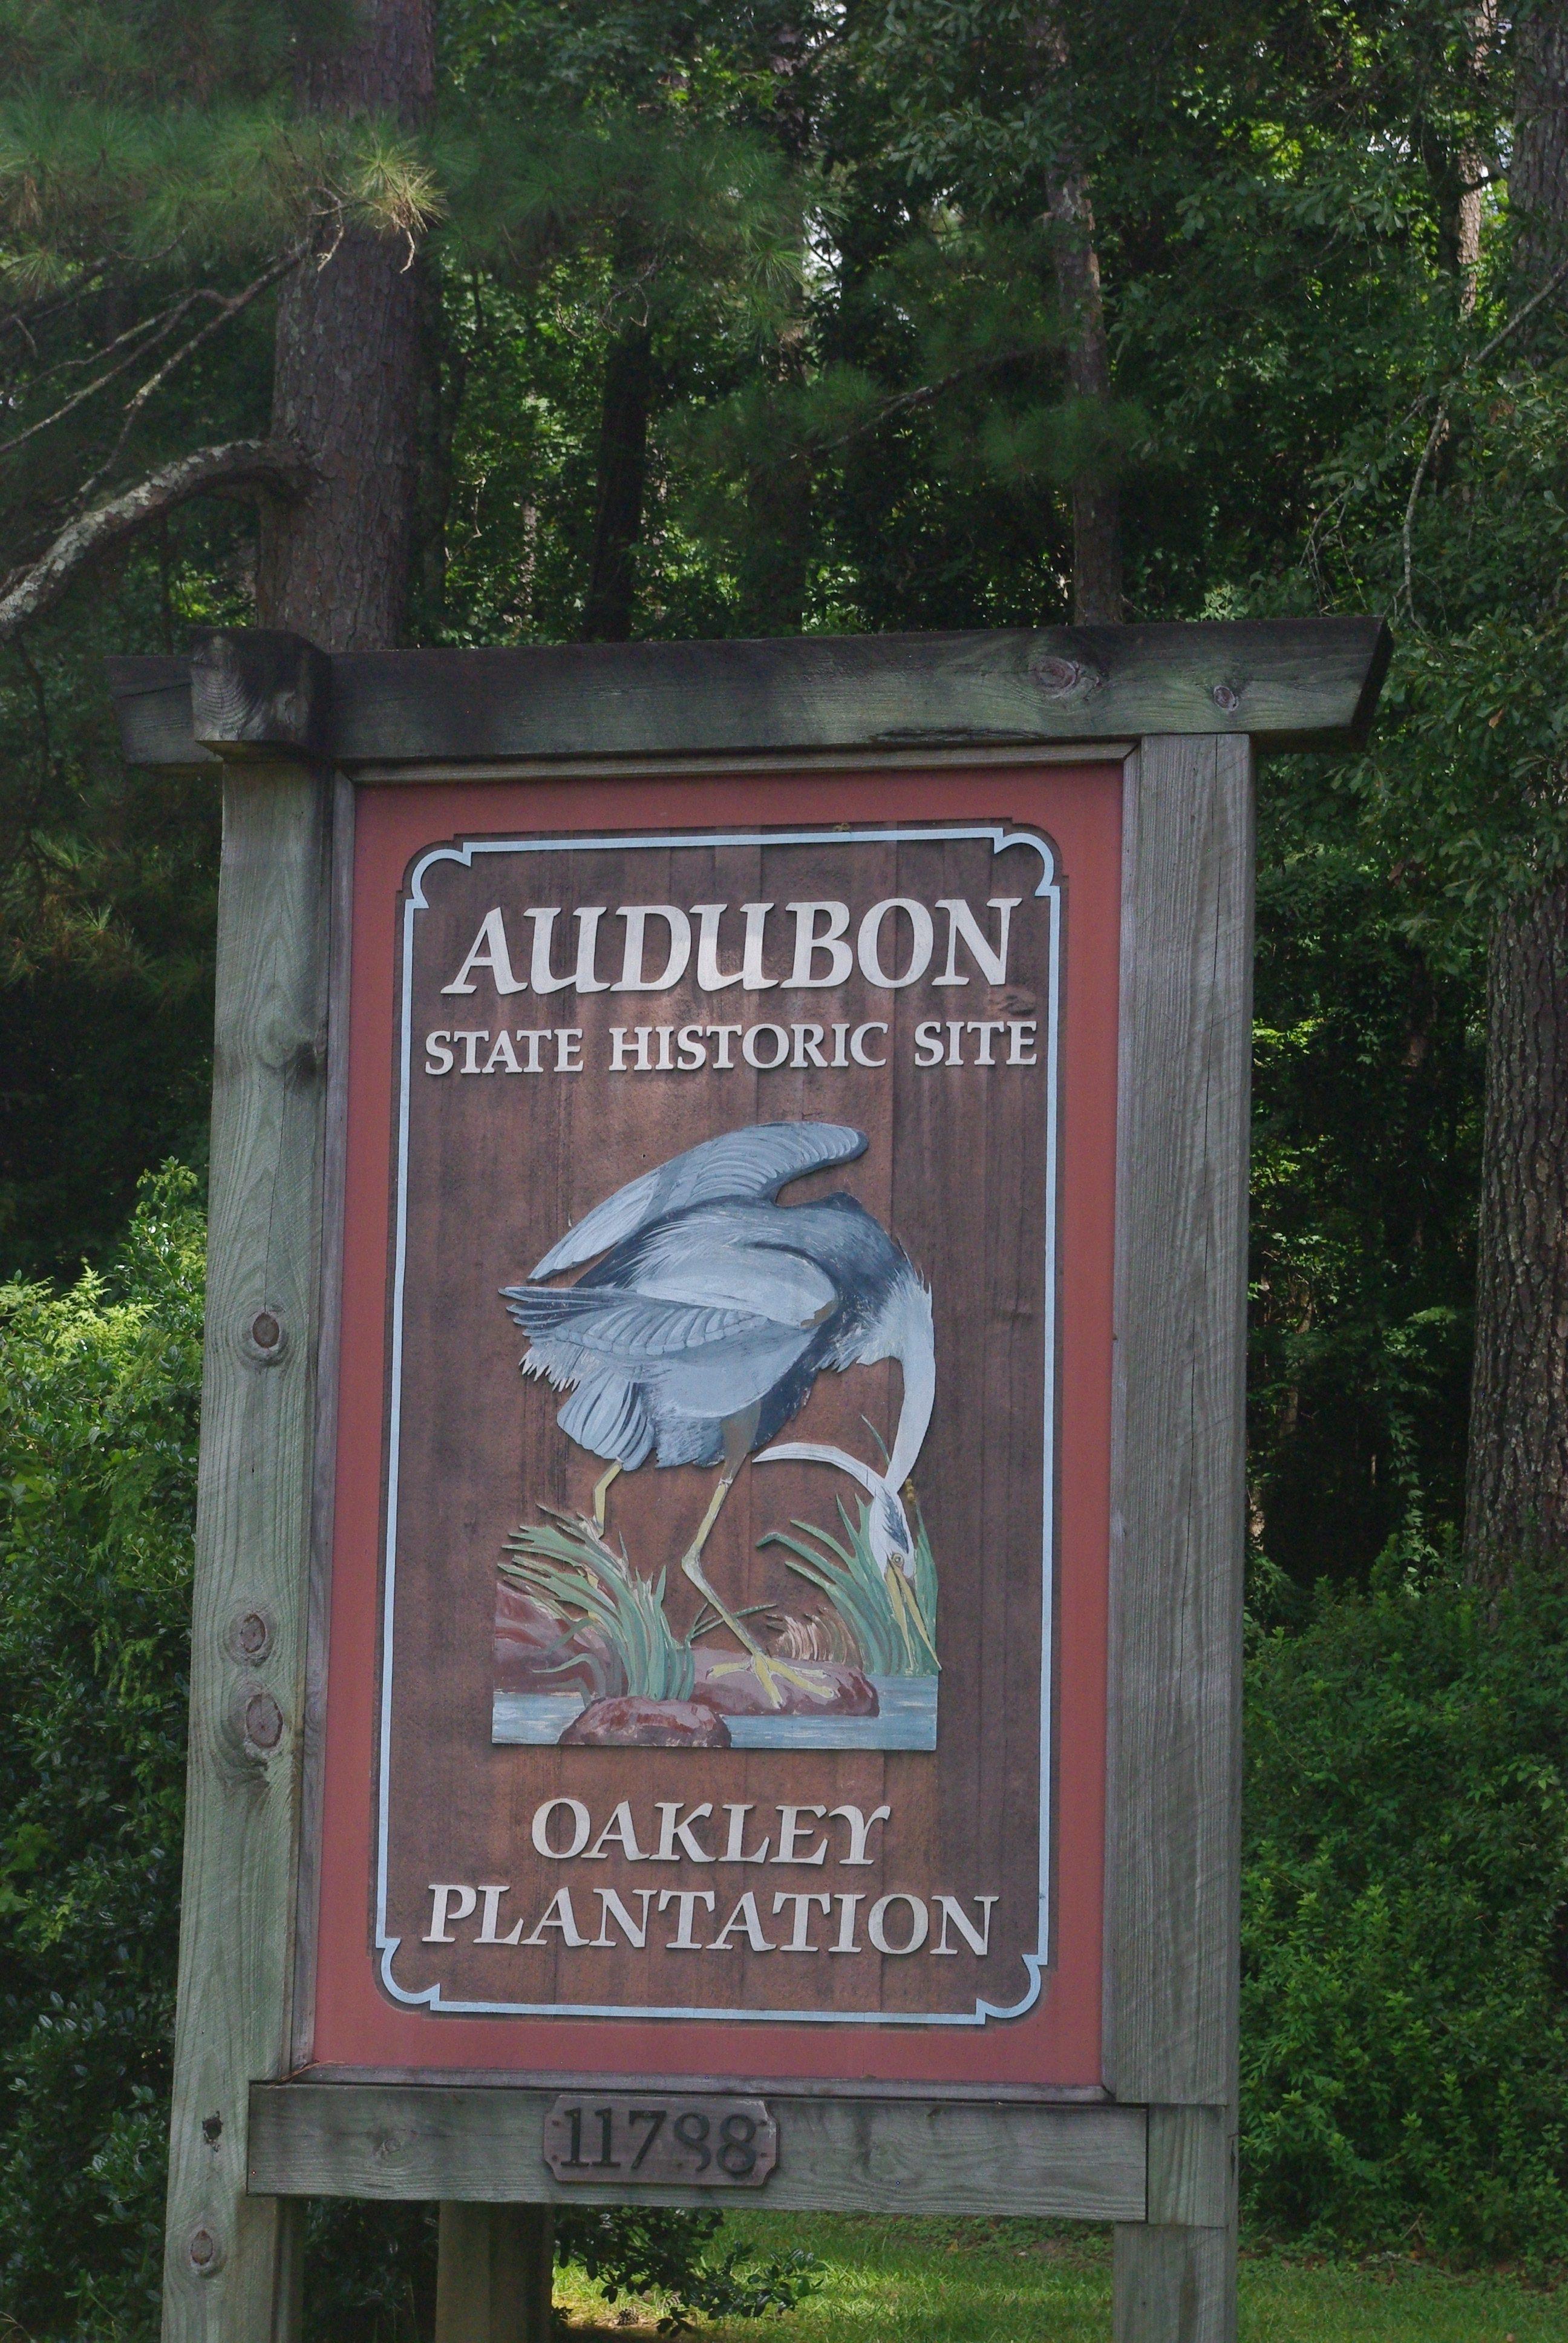 L'entrée de la plantation Oakley